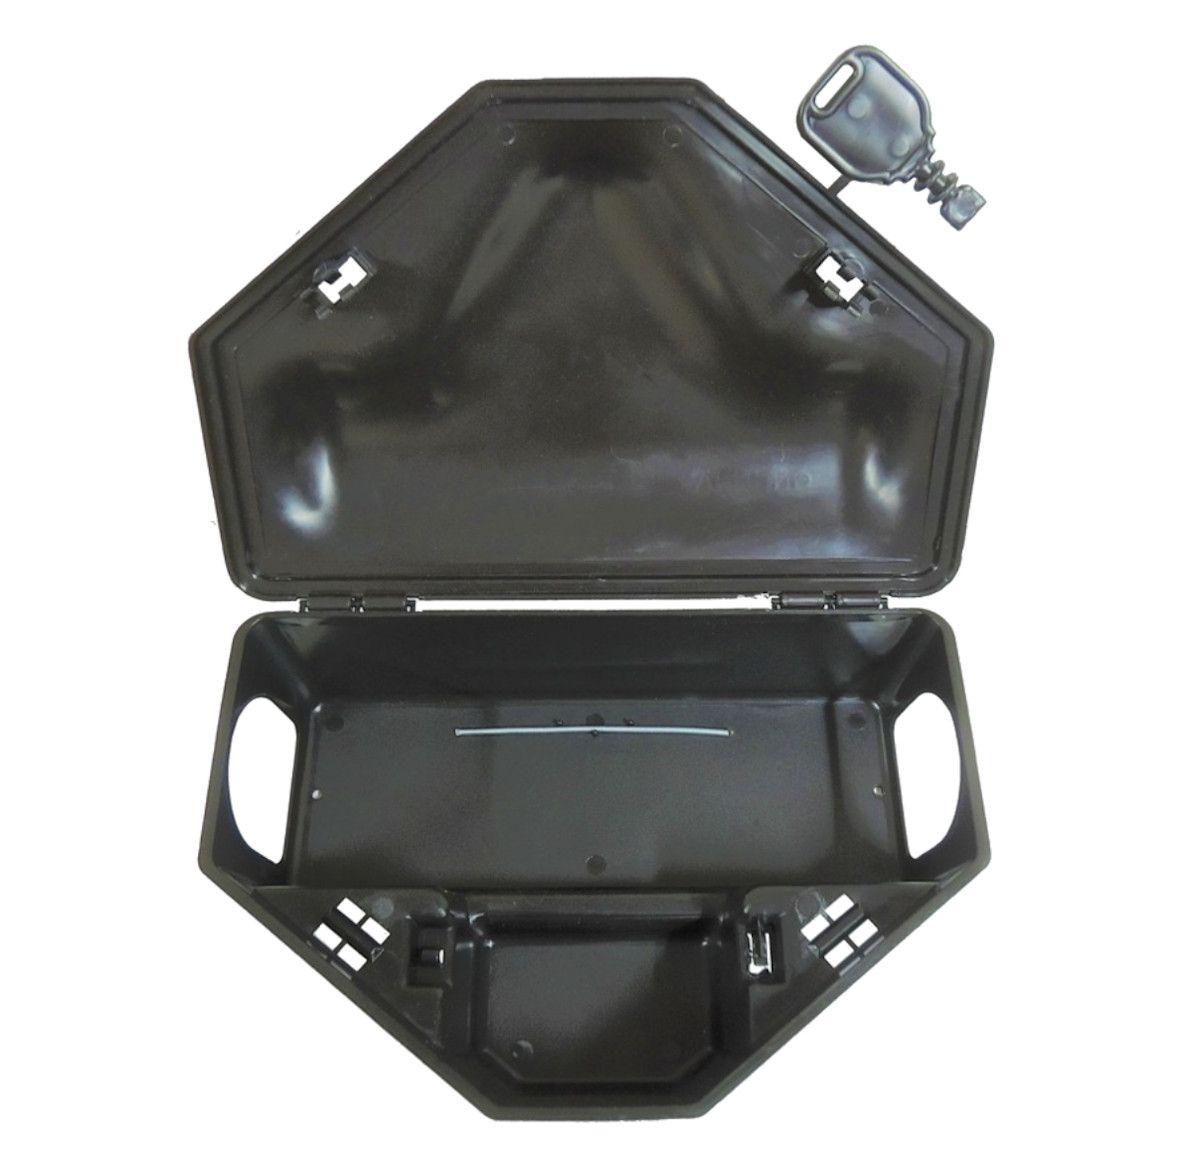 Kit 35 Porta Isca Com Chave Para Ratos